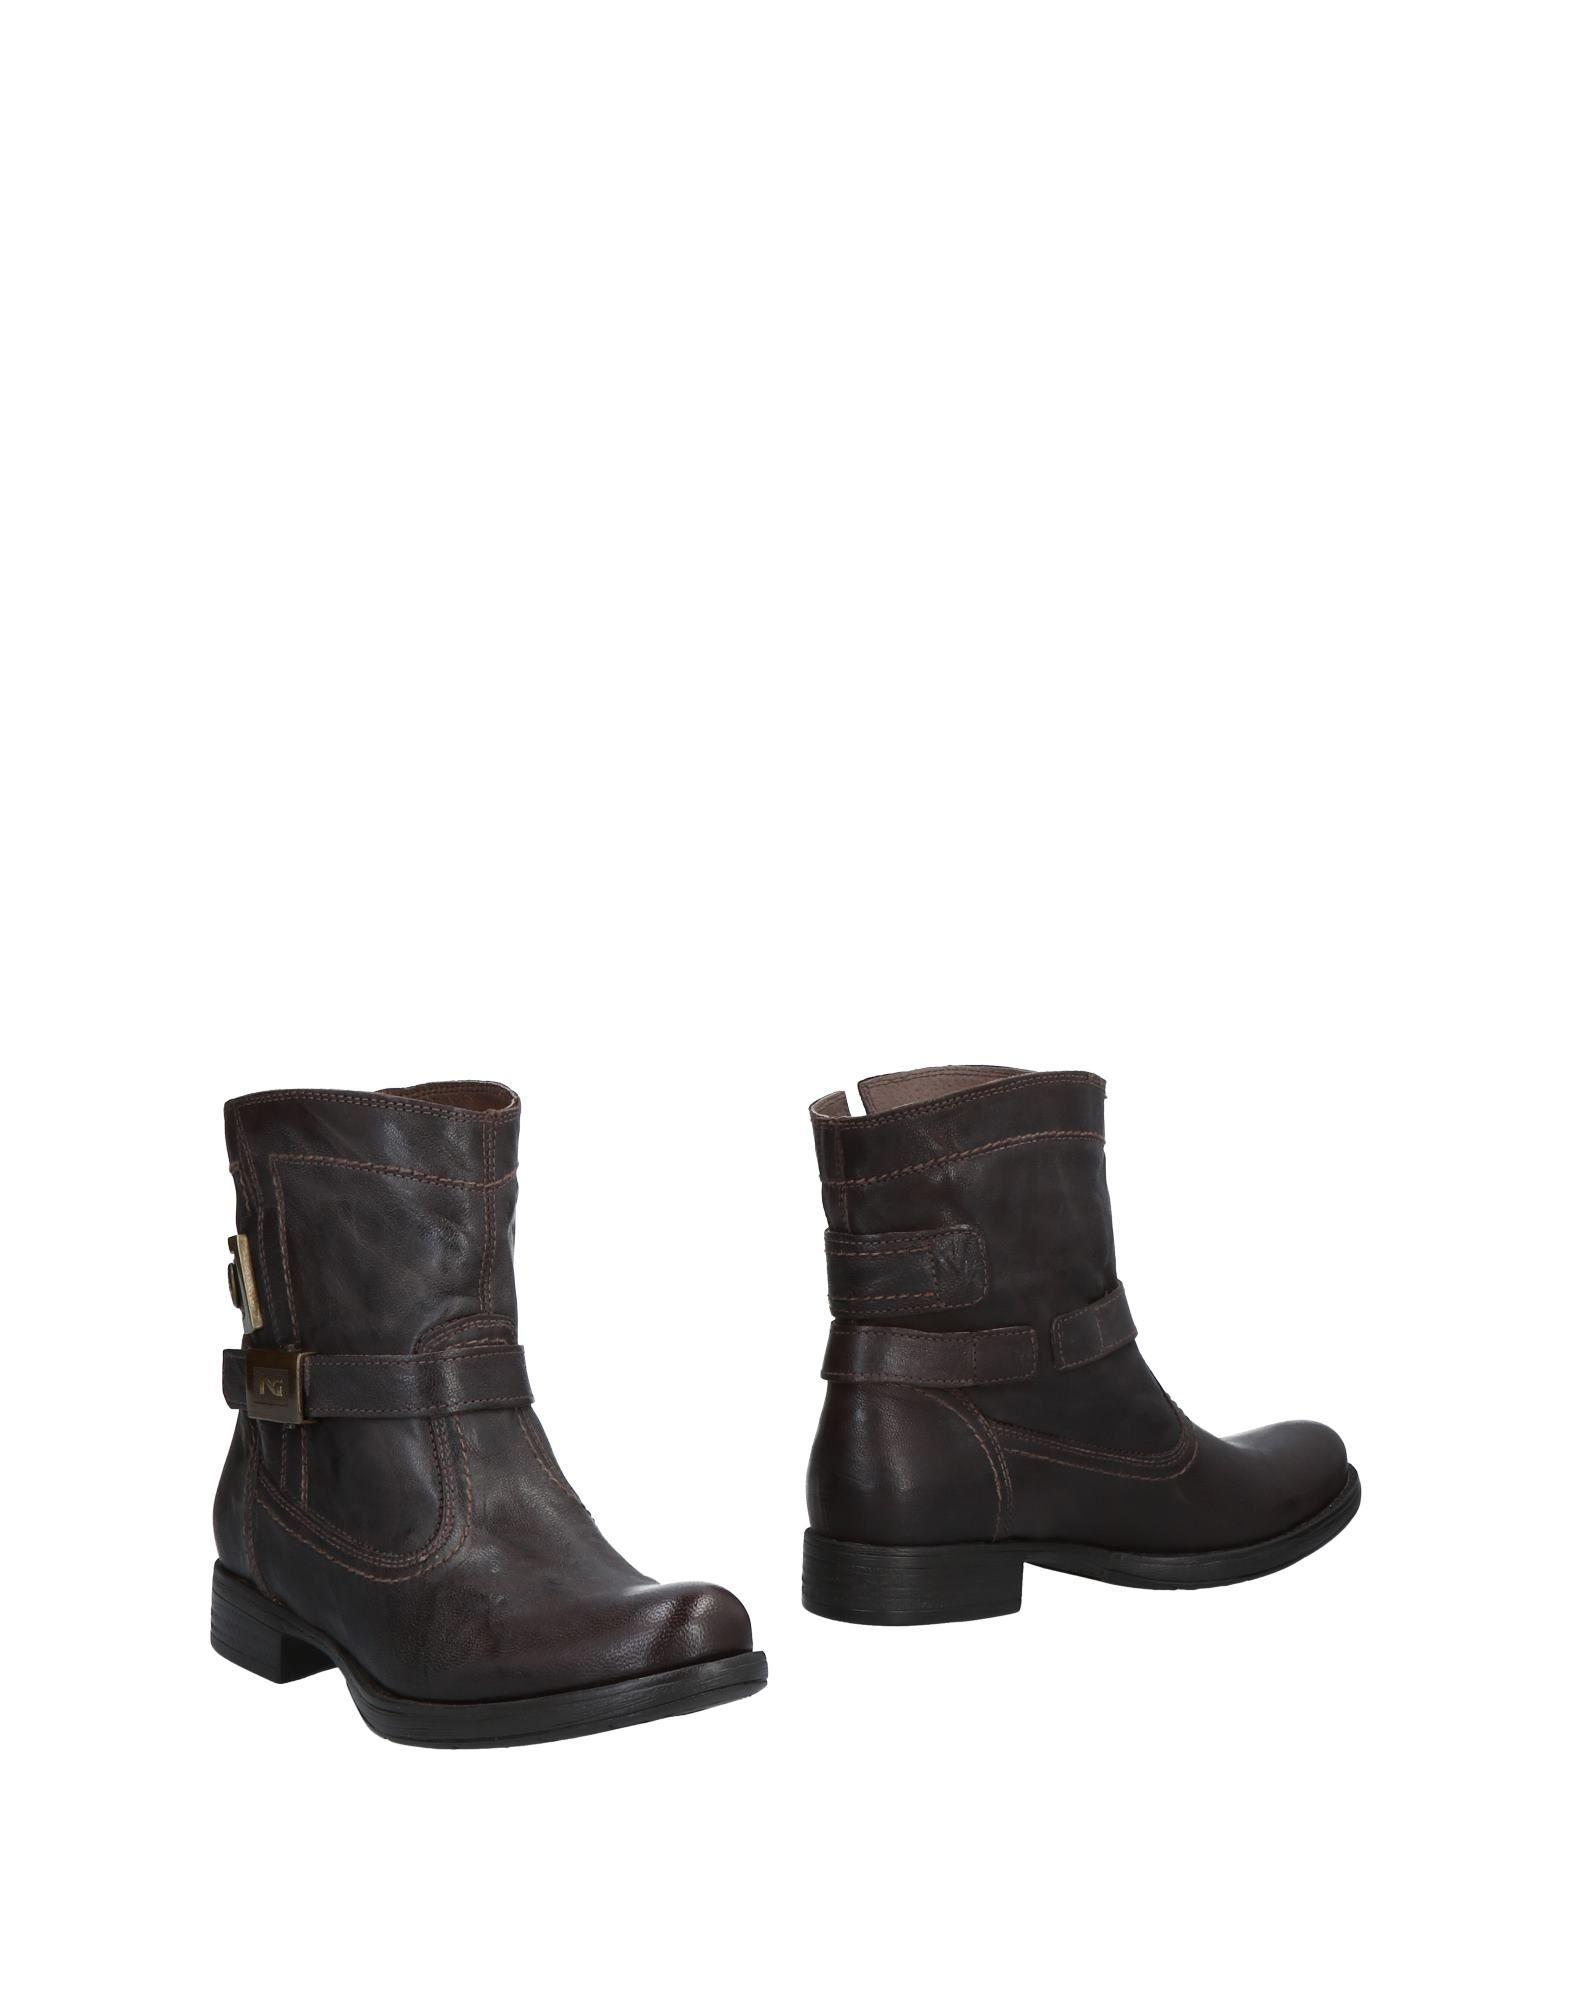 Nero Giardini Stiefelette Damen  11487581EK Gute Qualität beliebte Schuhe